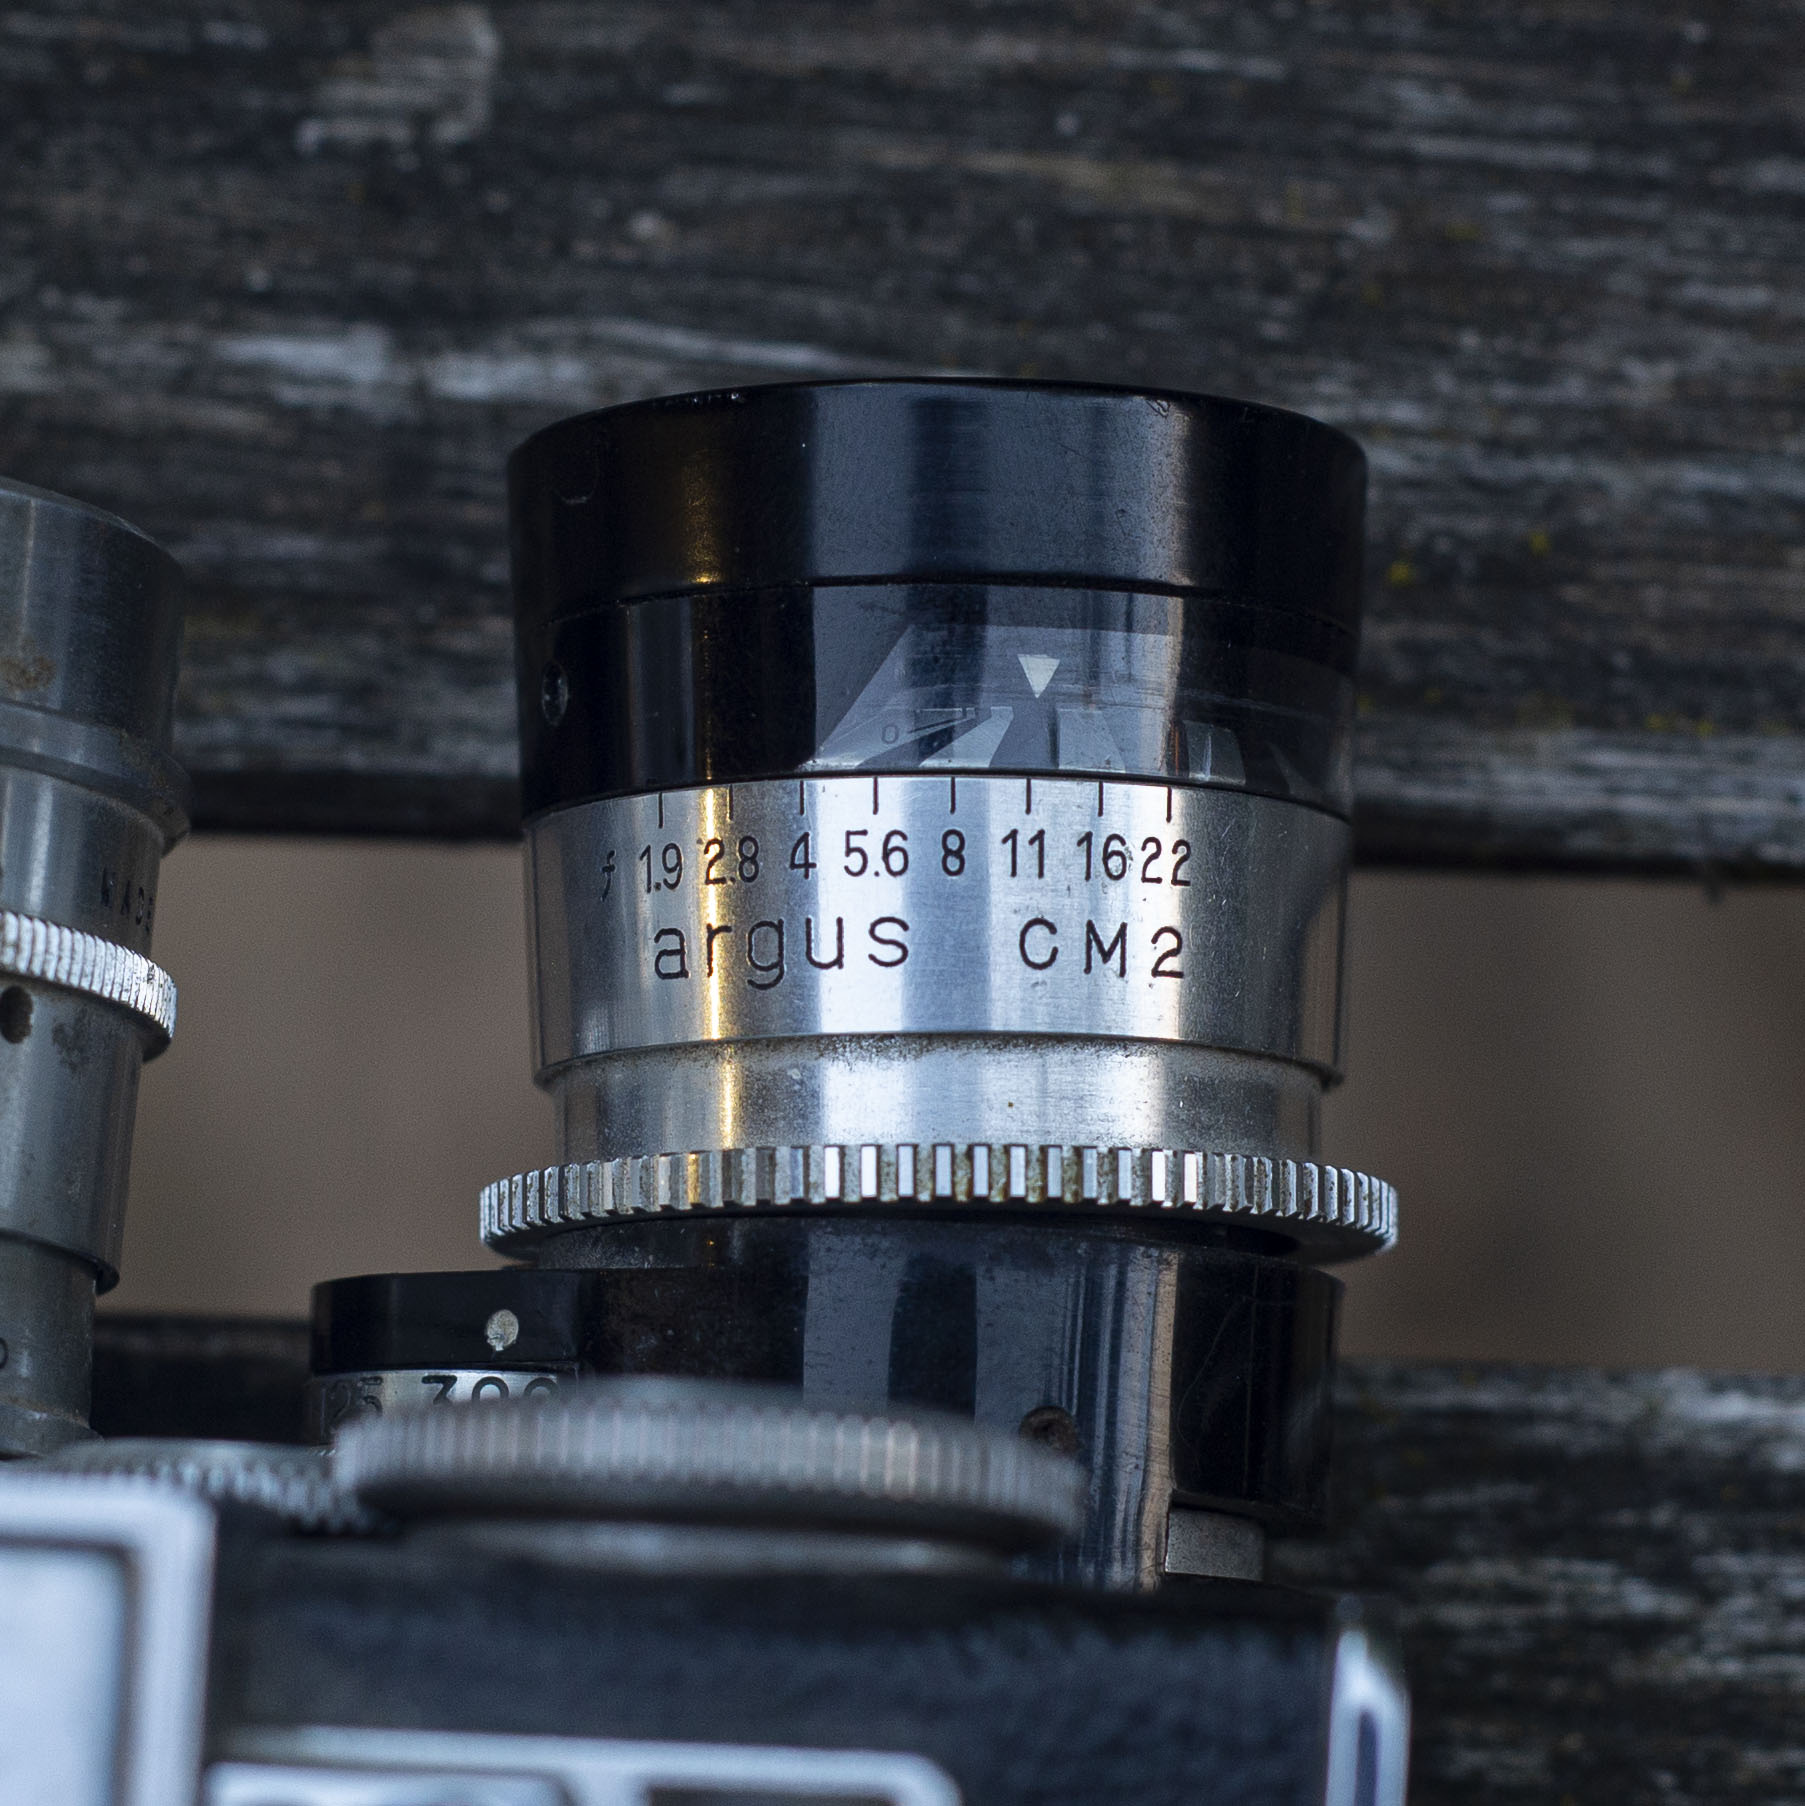 Argus C33 light meter